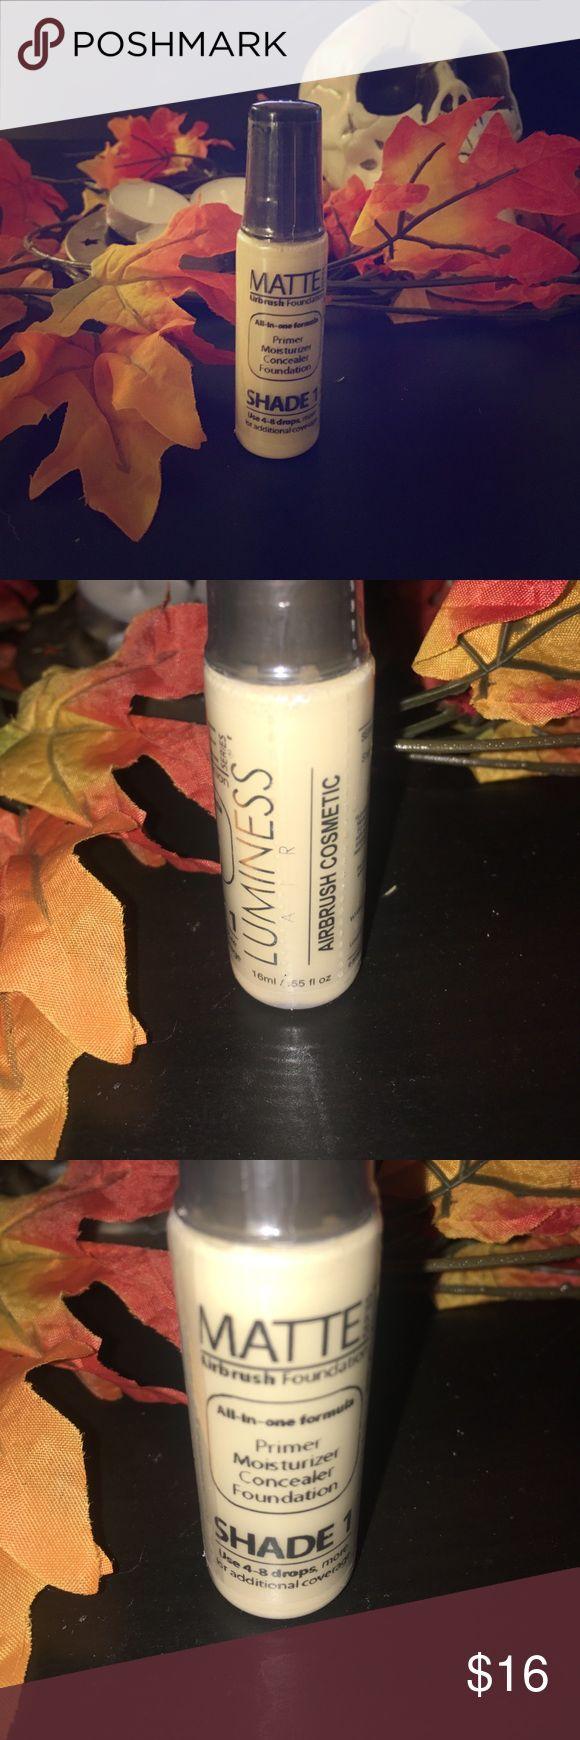 Luminess Airbrush Makeup Matte Primer/Moisturizer/Concealer/Foundation Luminess Air Makeup Face Primer